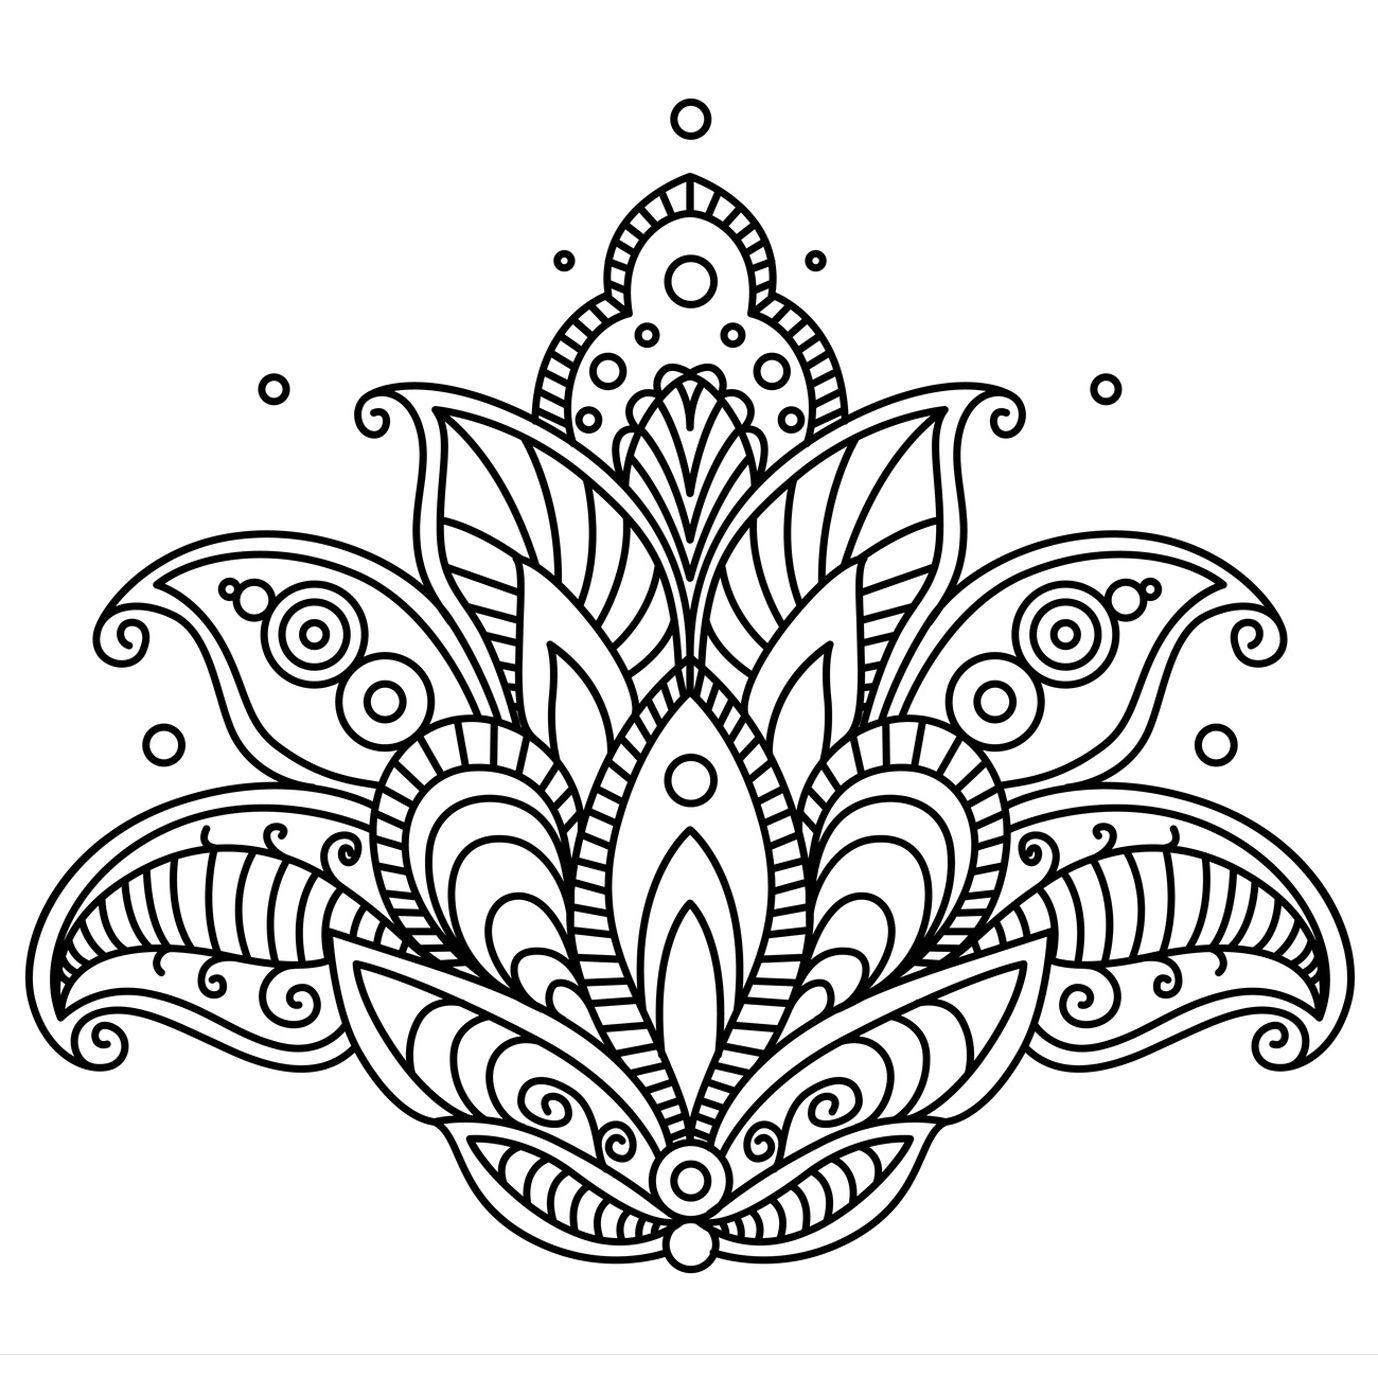 Mandala - Buscar Con Google | Coloriage Mandala, Coloriage à Coloriage